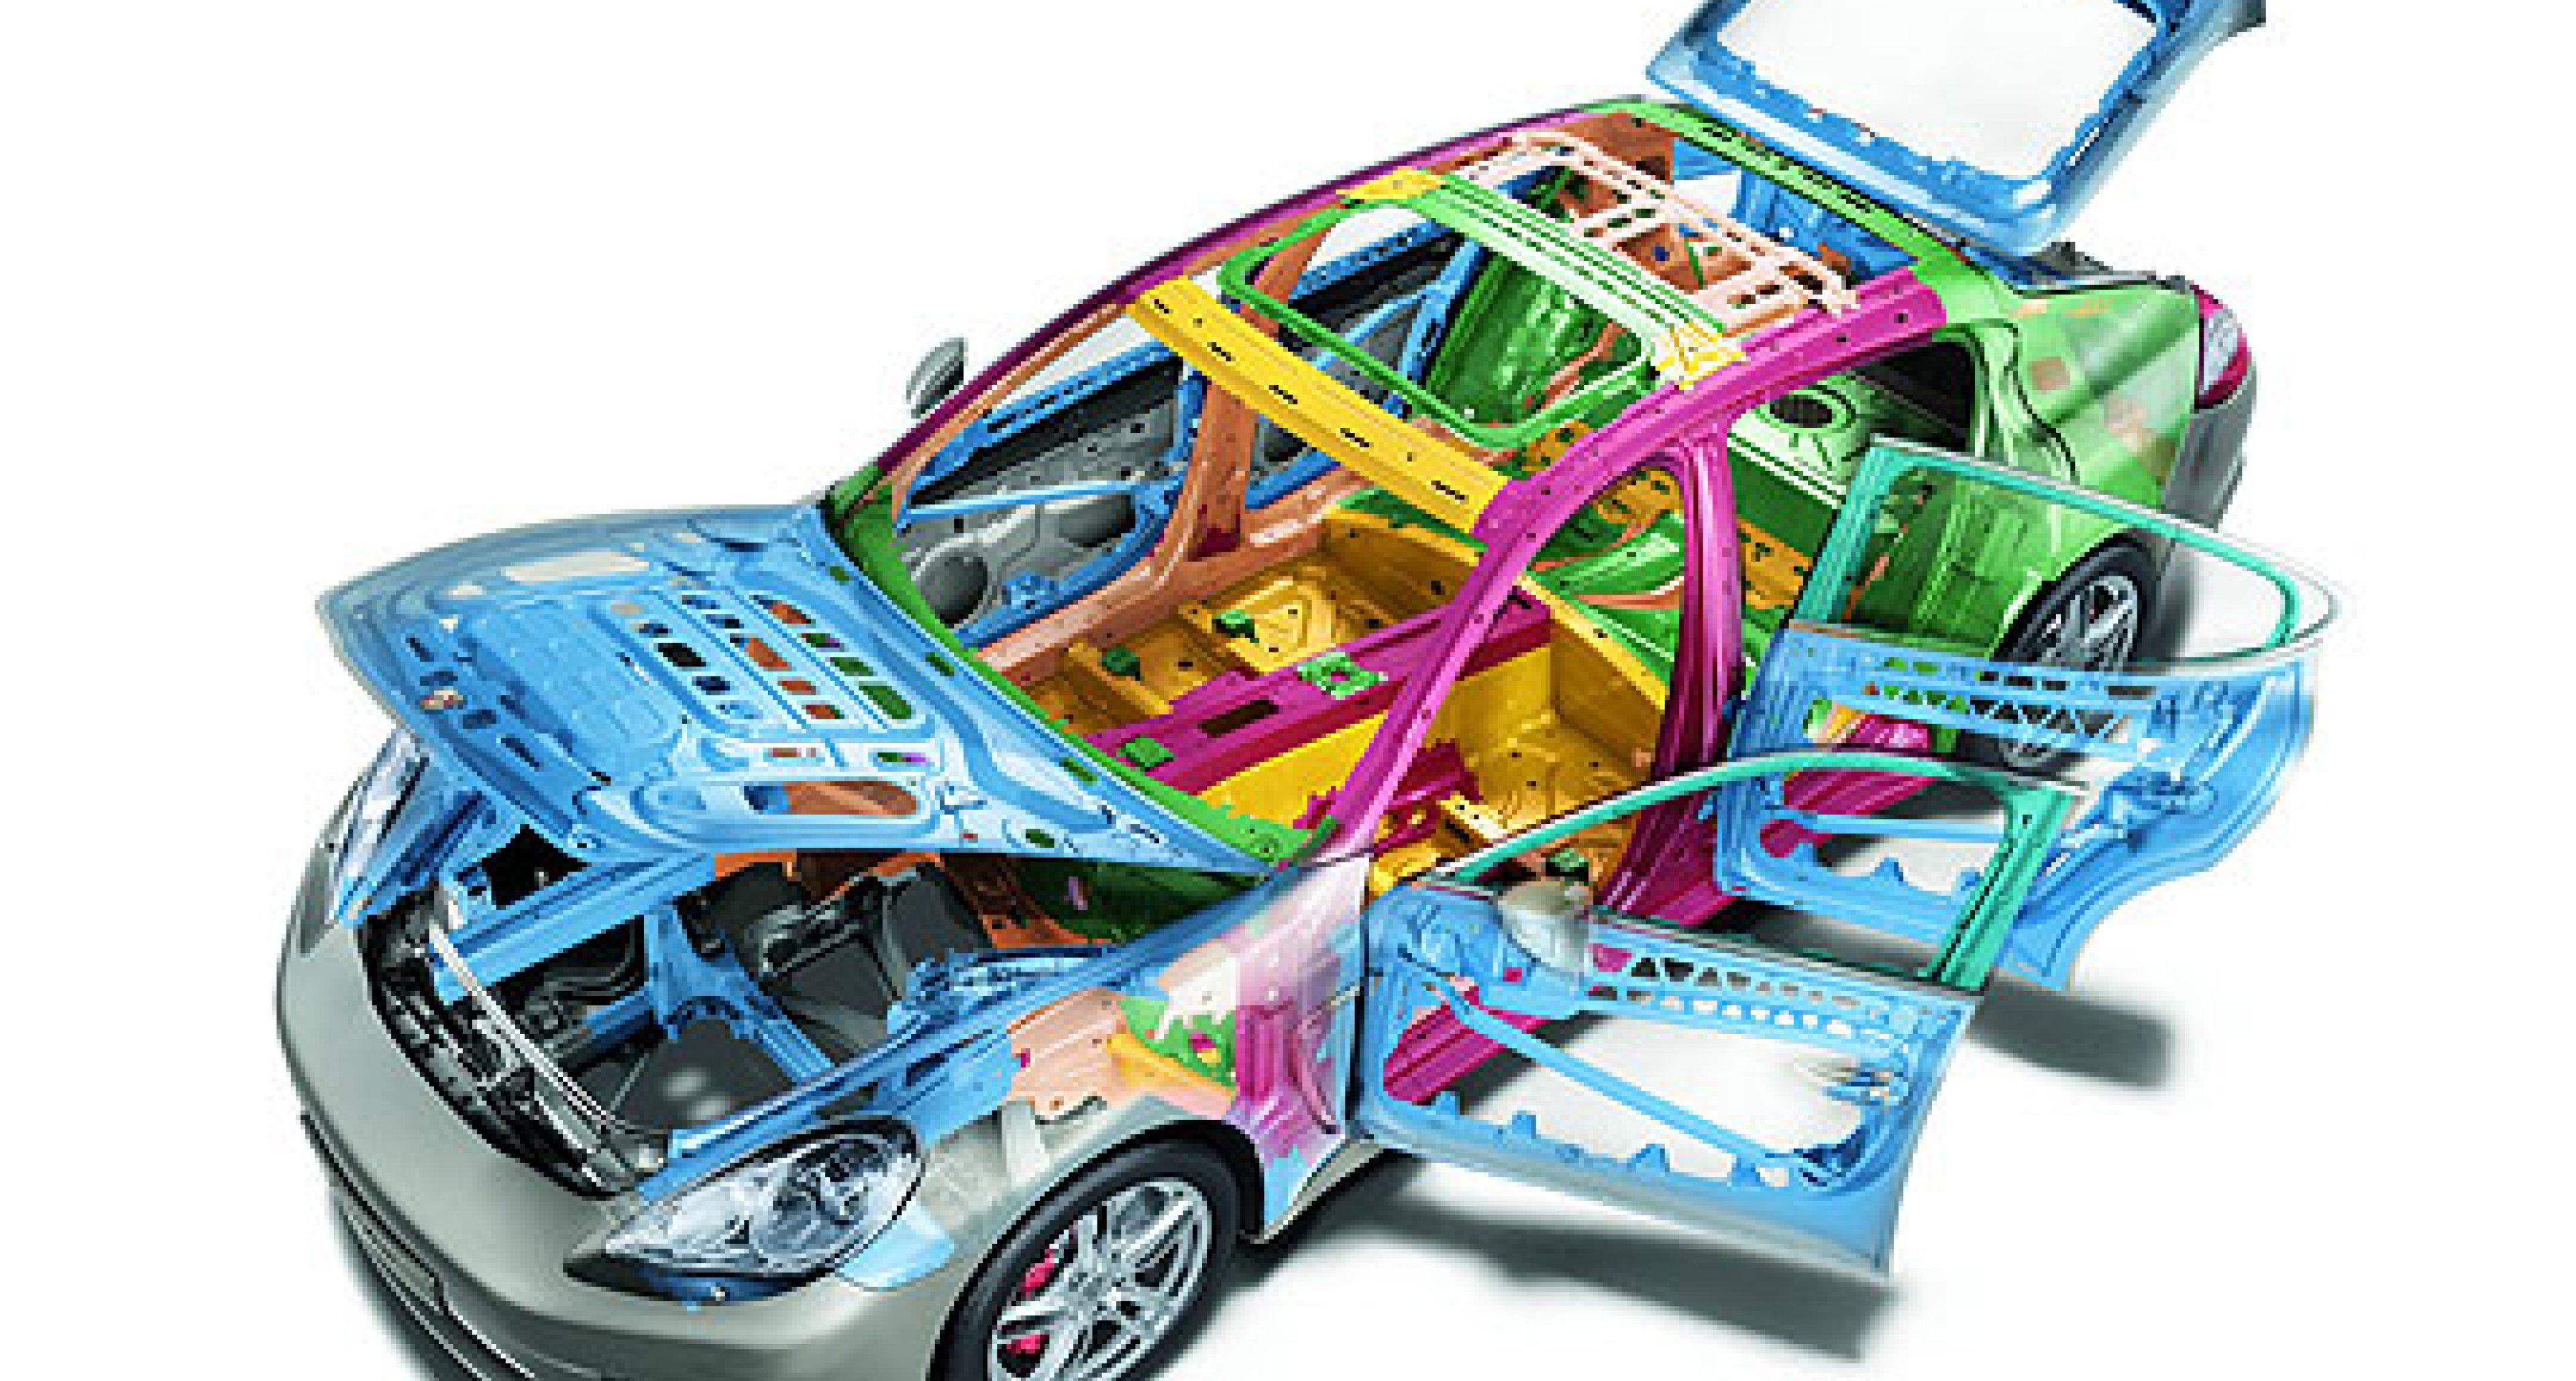 Porsche Panamera: More Technical Innovation